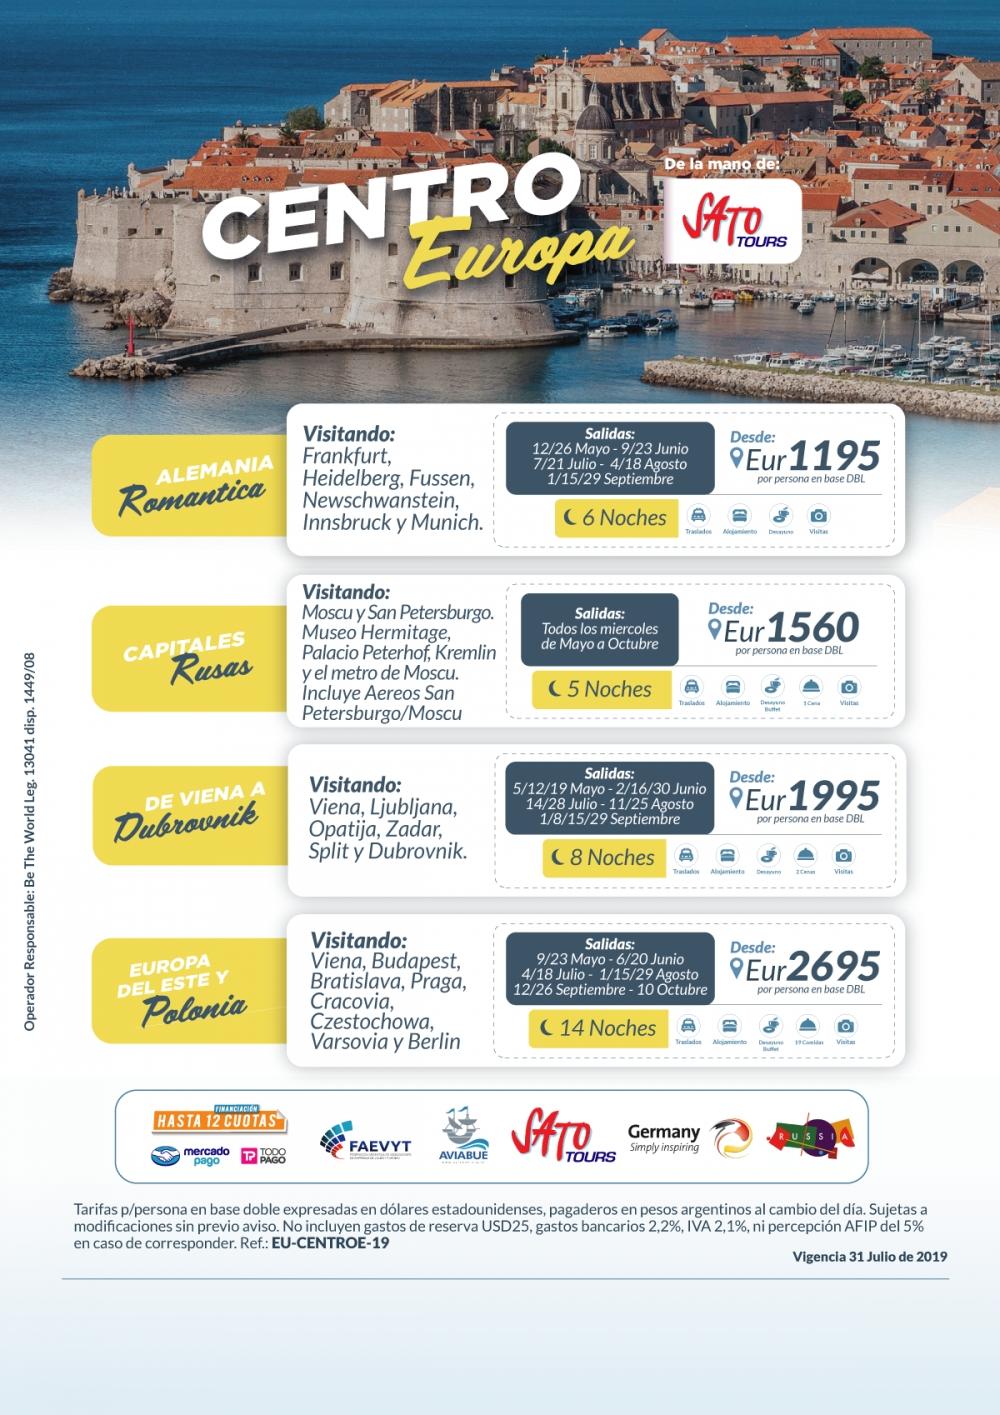 CENTRO EUROPA - Con Sato